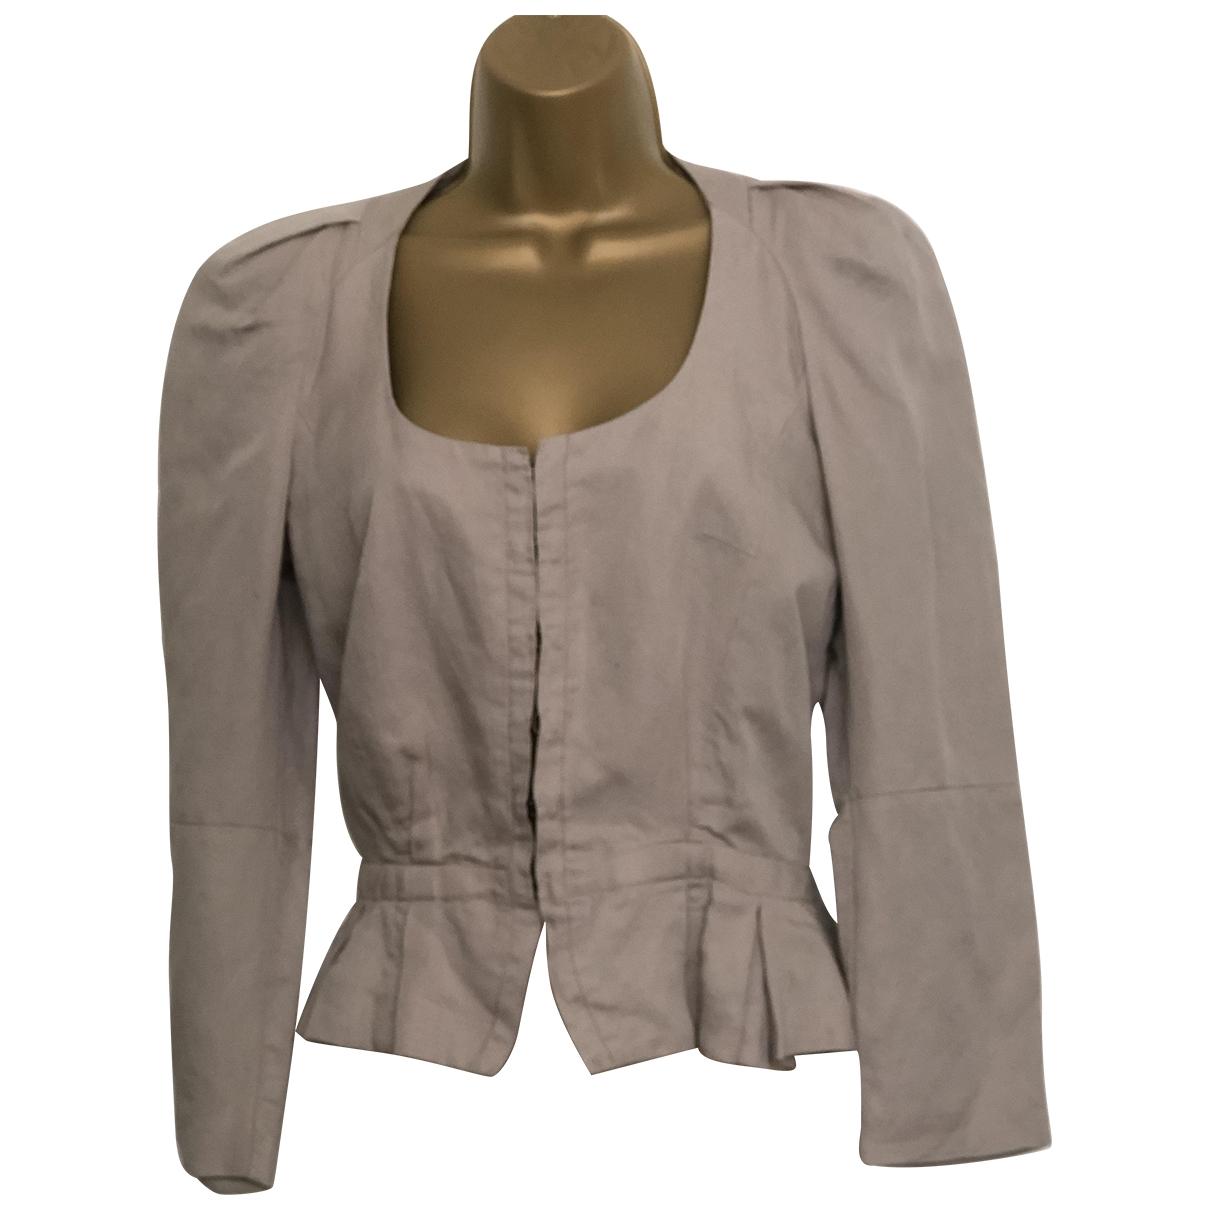 Isabel Marant Etoile \N Beige Linen jacket for Women S International